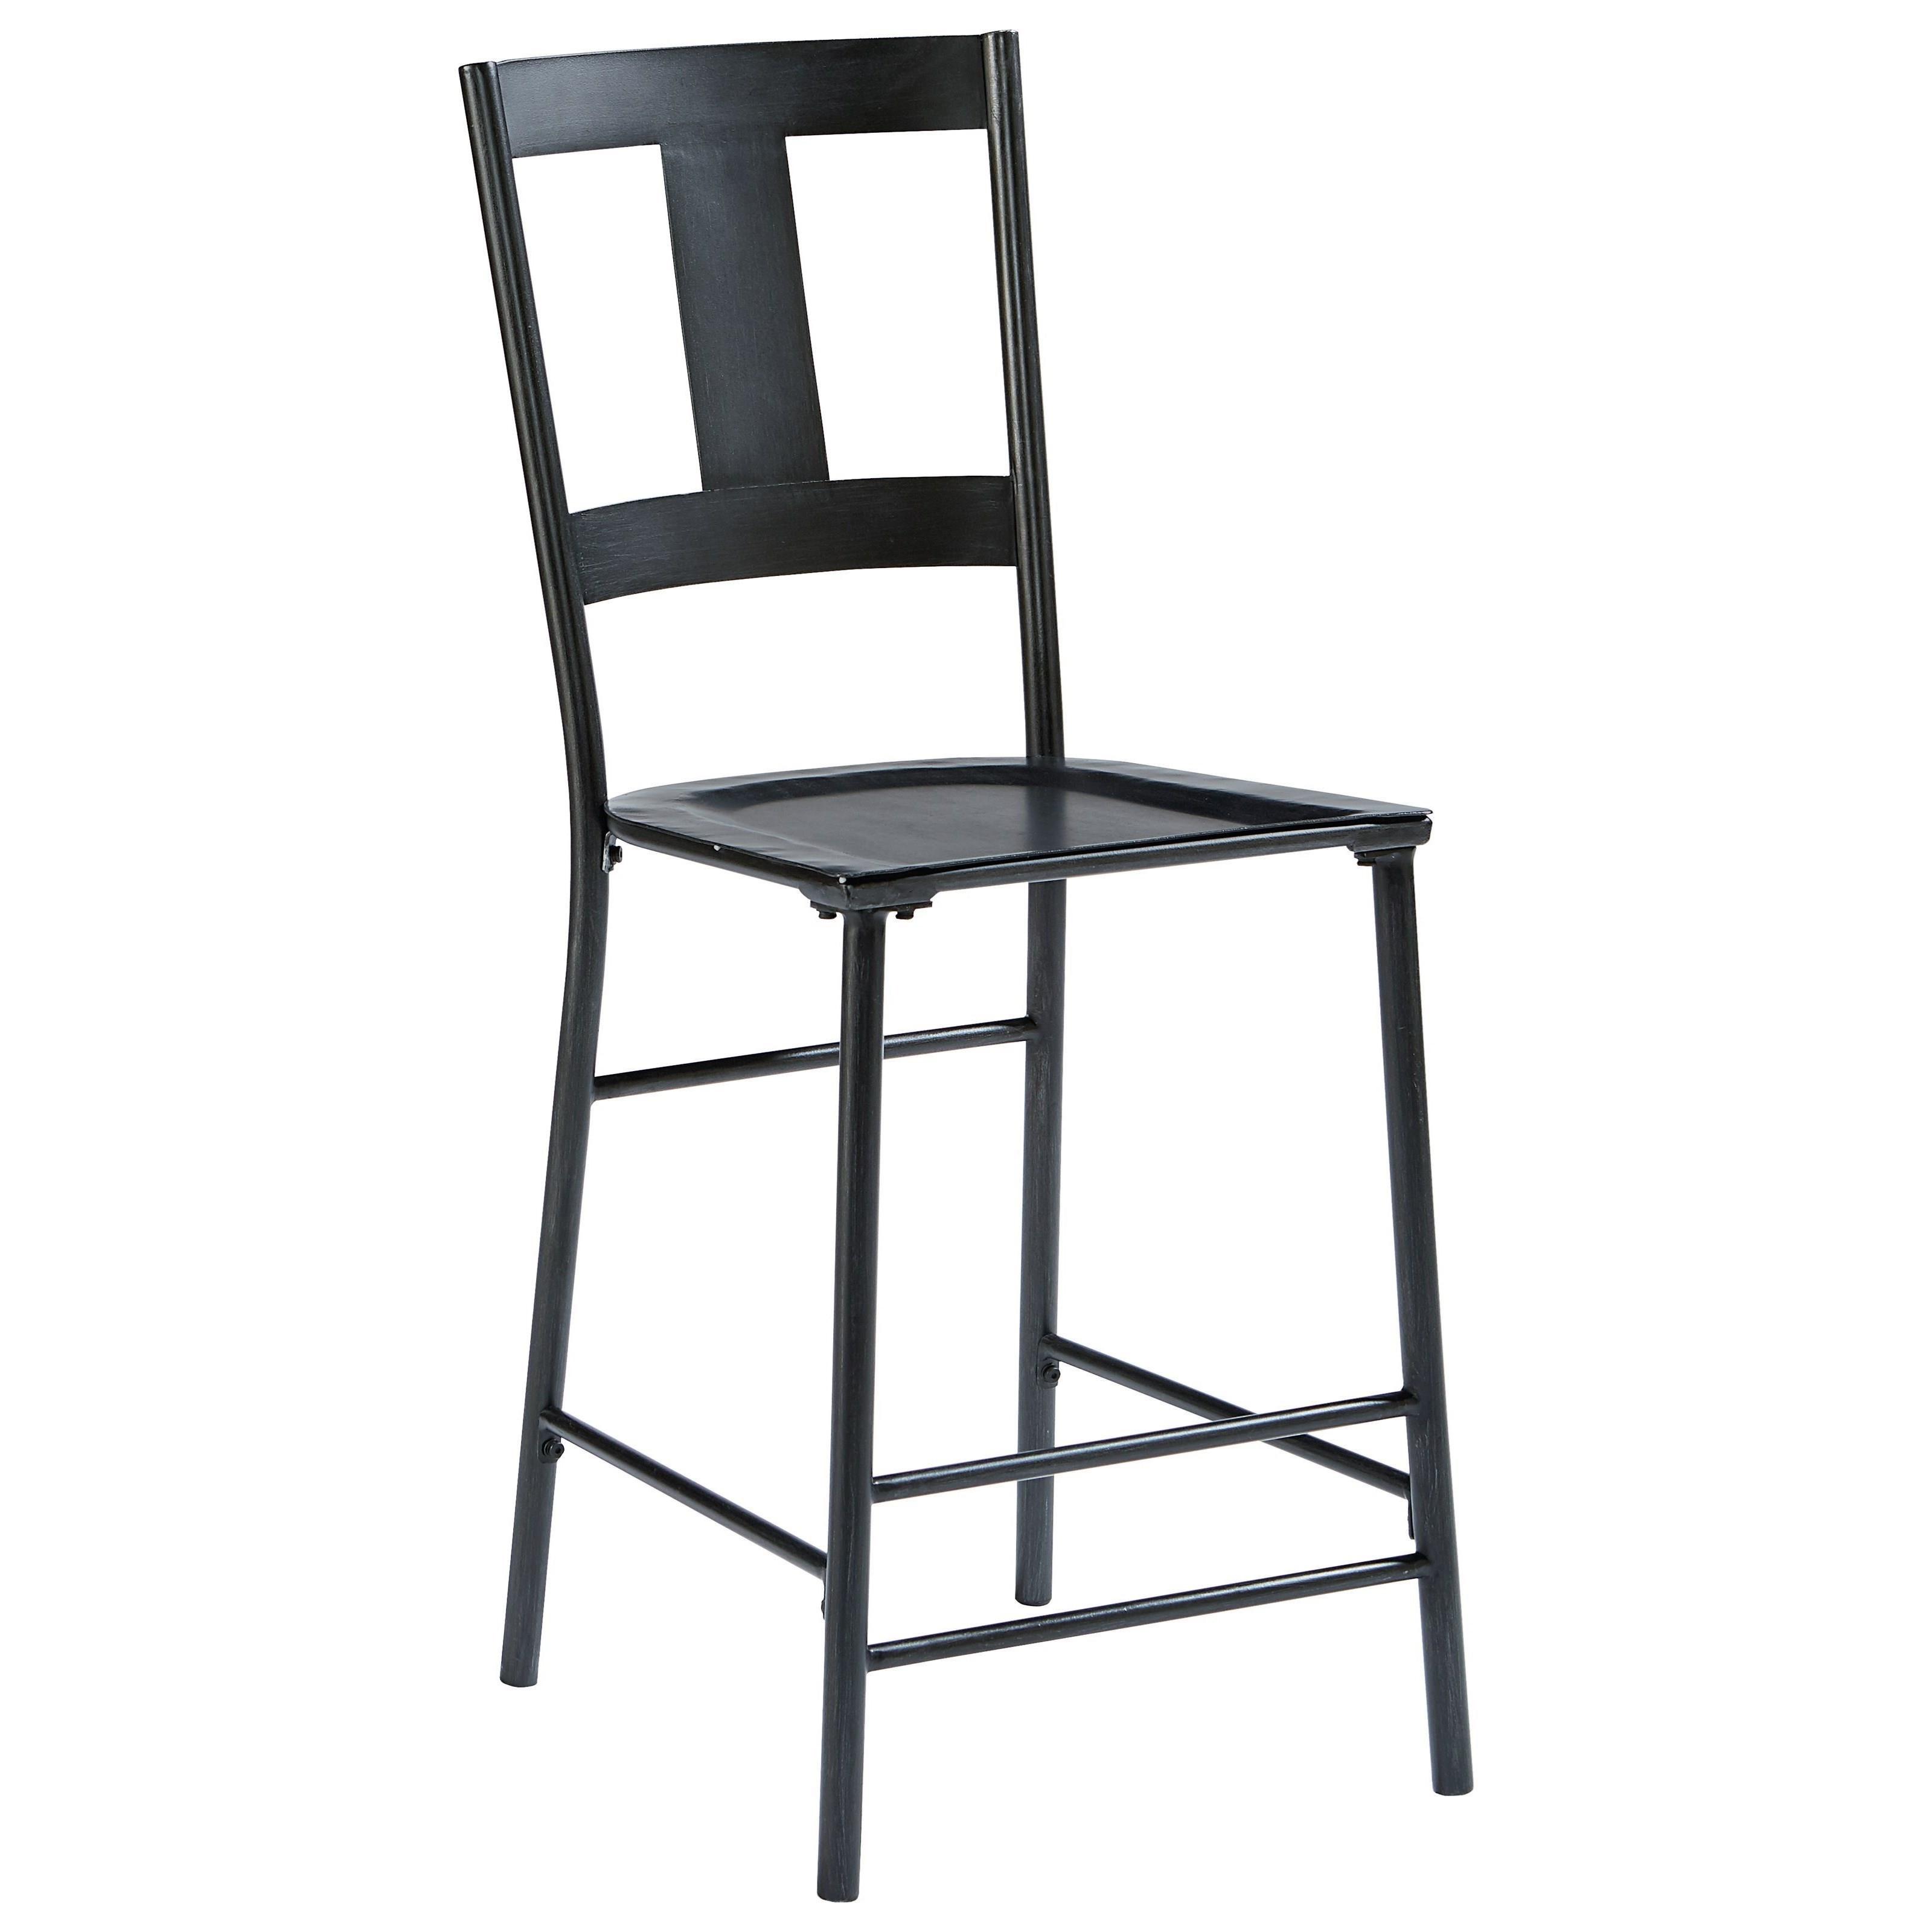 metal furniture. Industrial Metal Furniture. Magnolia Home By Joanna Gaines And Wood Barstool - Item Furniture